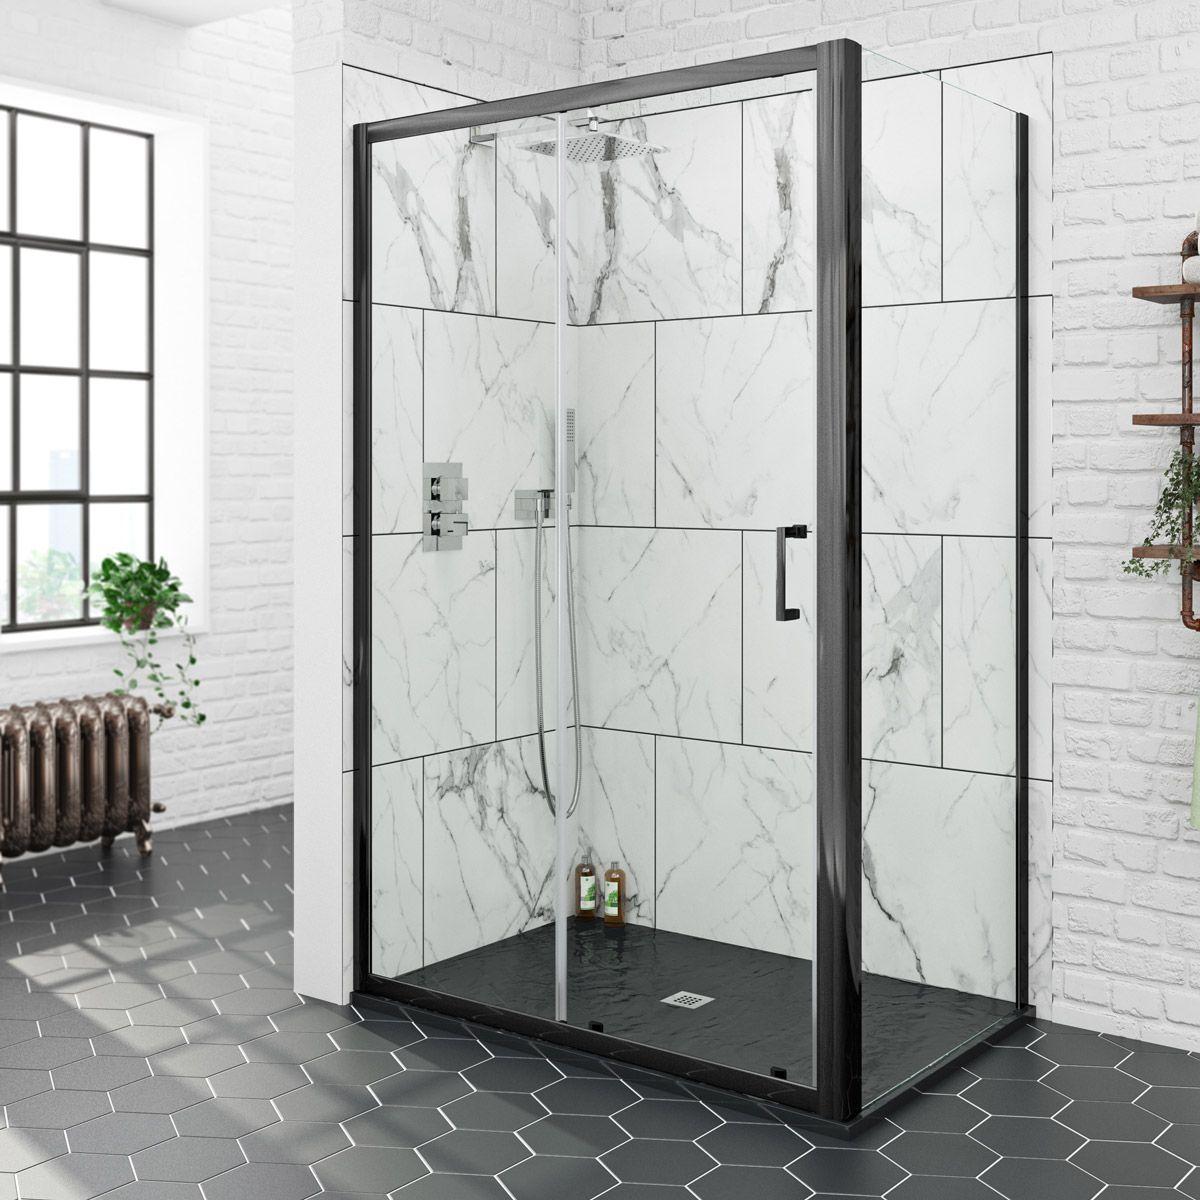 Mode Black 6mm Sliding Shower Enclosure With Black Slate Effect Tray 1200 X 800 Shower Enclosure Rectangular Shower Enclosures Black Shower